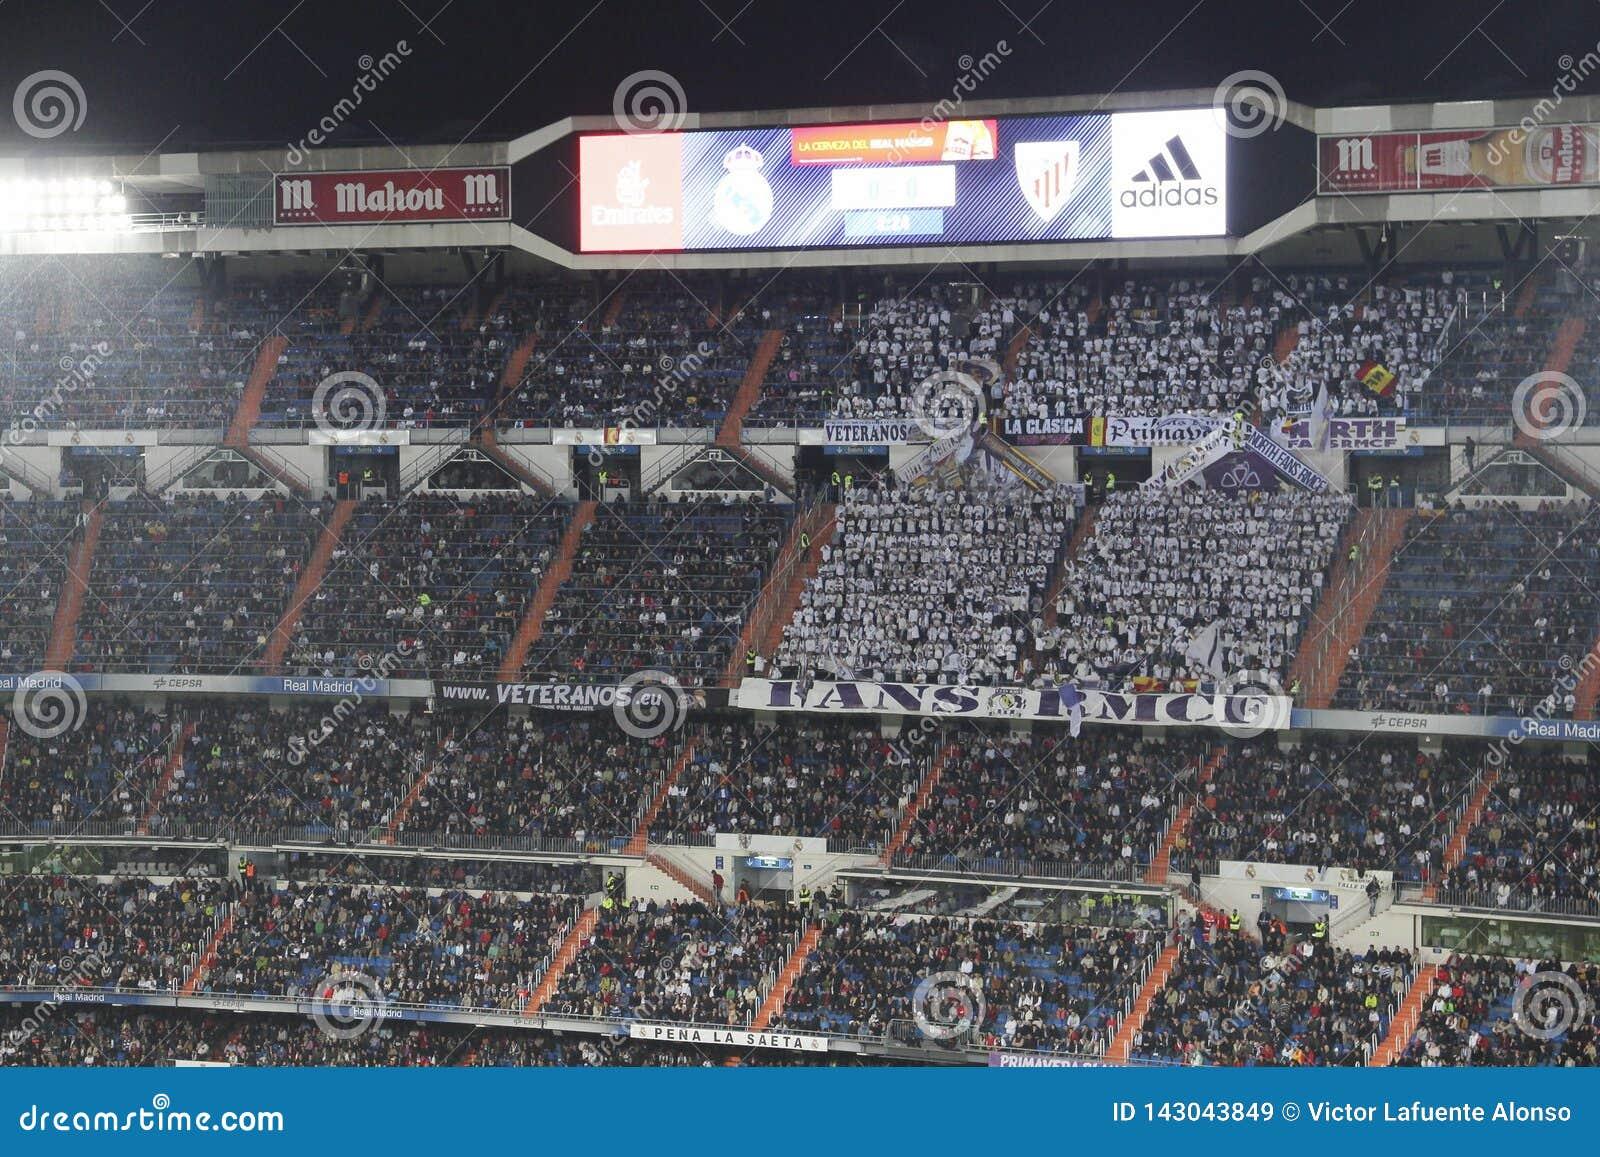 Nosotros mismos vitalidad plátano  Santiago Bernabeu Stadium During A Real Madrid Match In 2016 Editorial  Stock Image - Image of goal, europe: 143043849